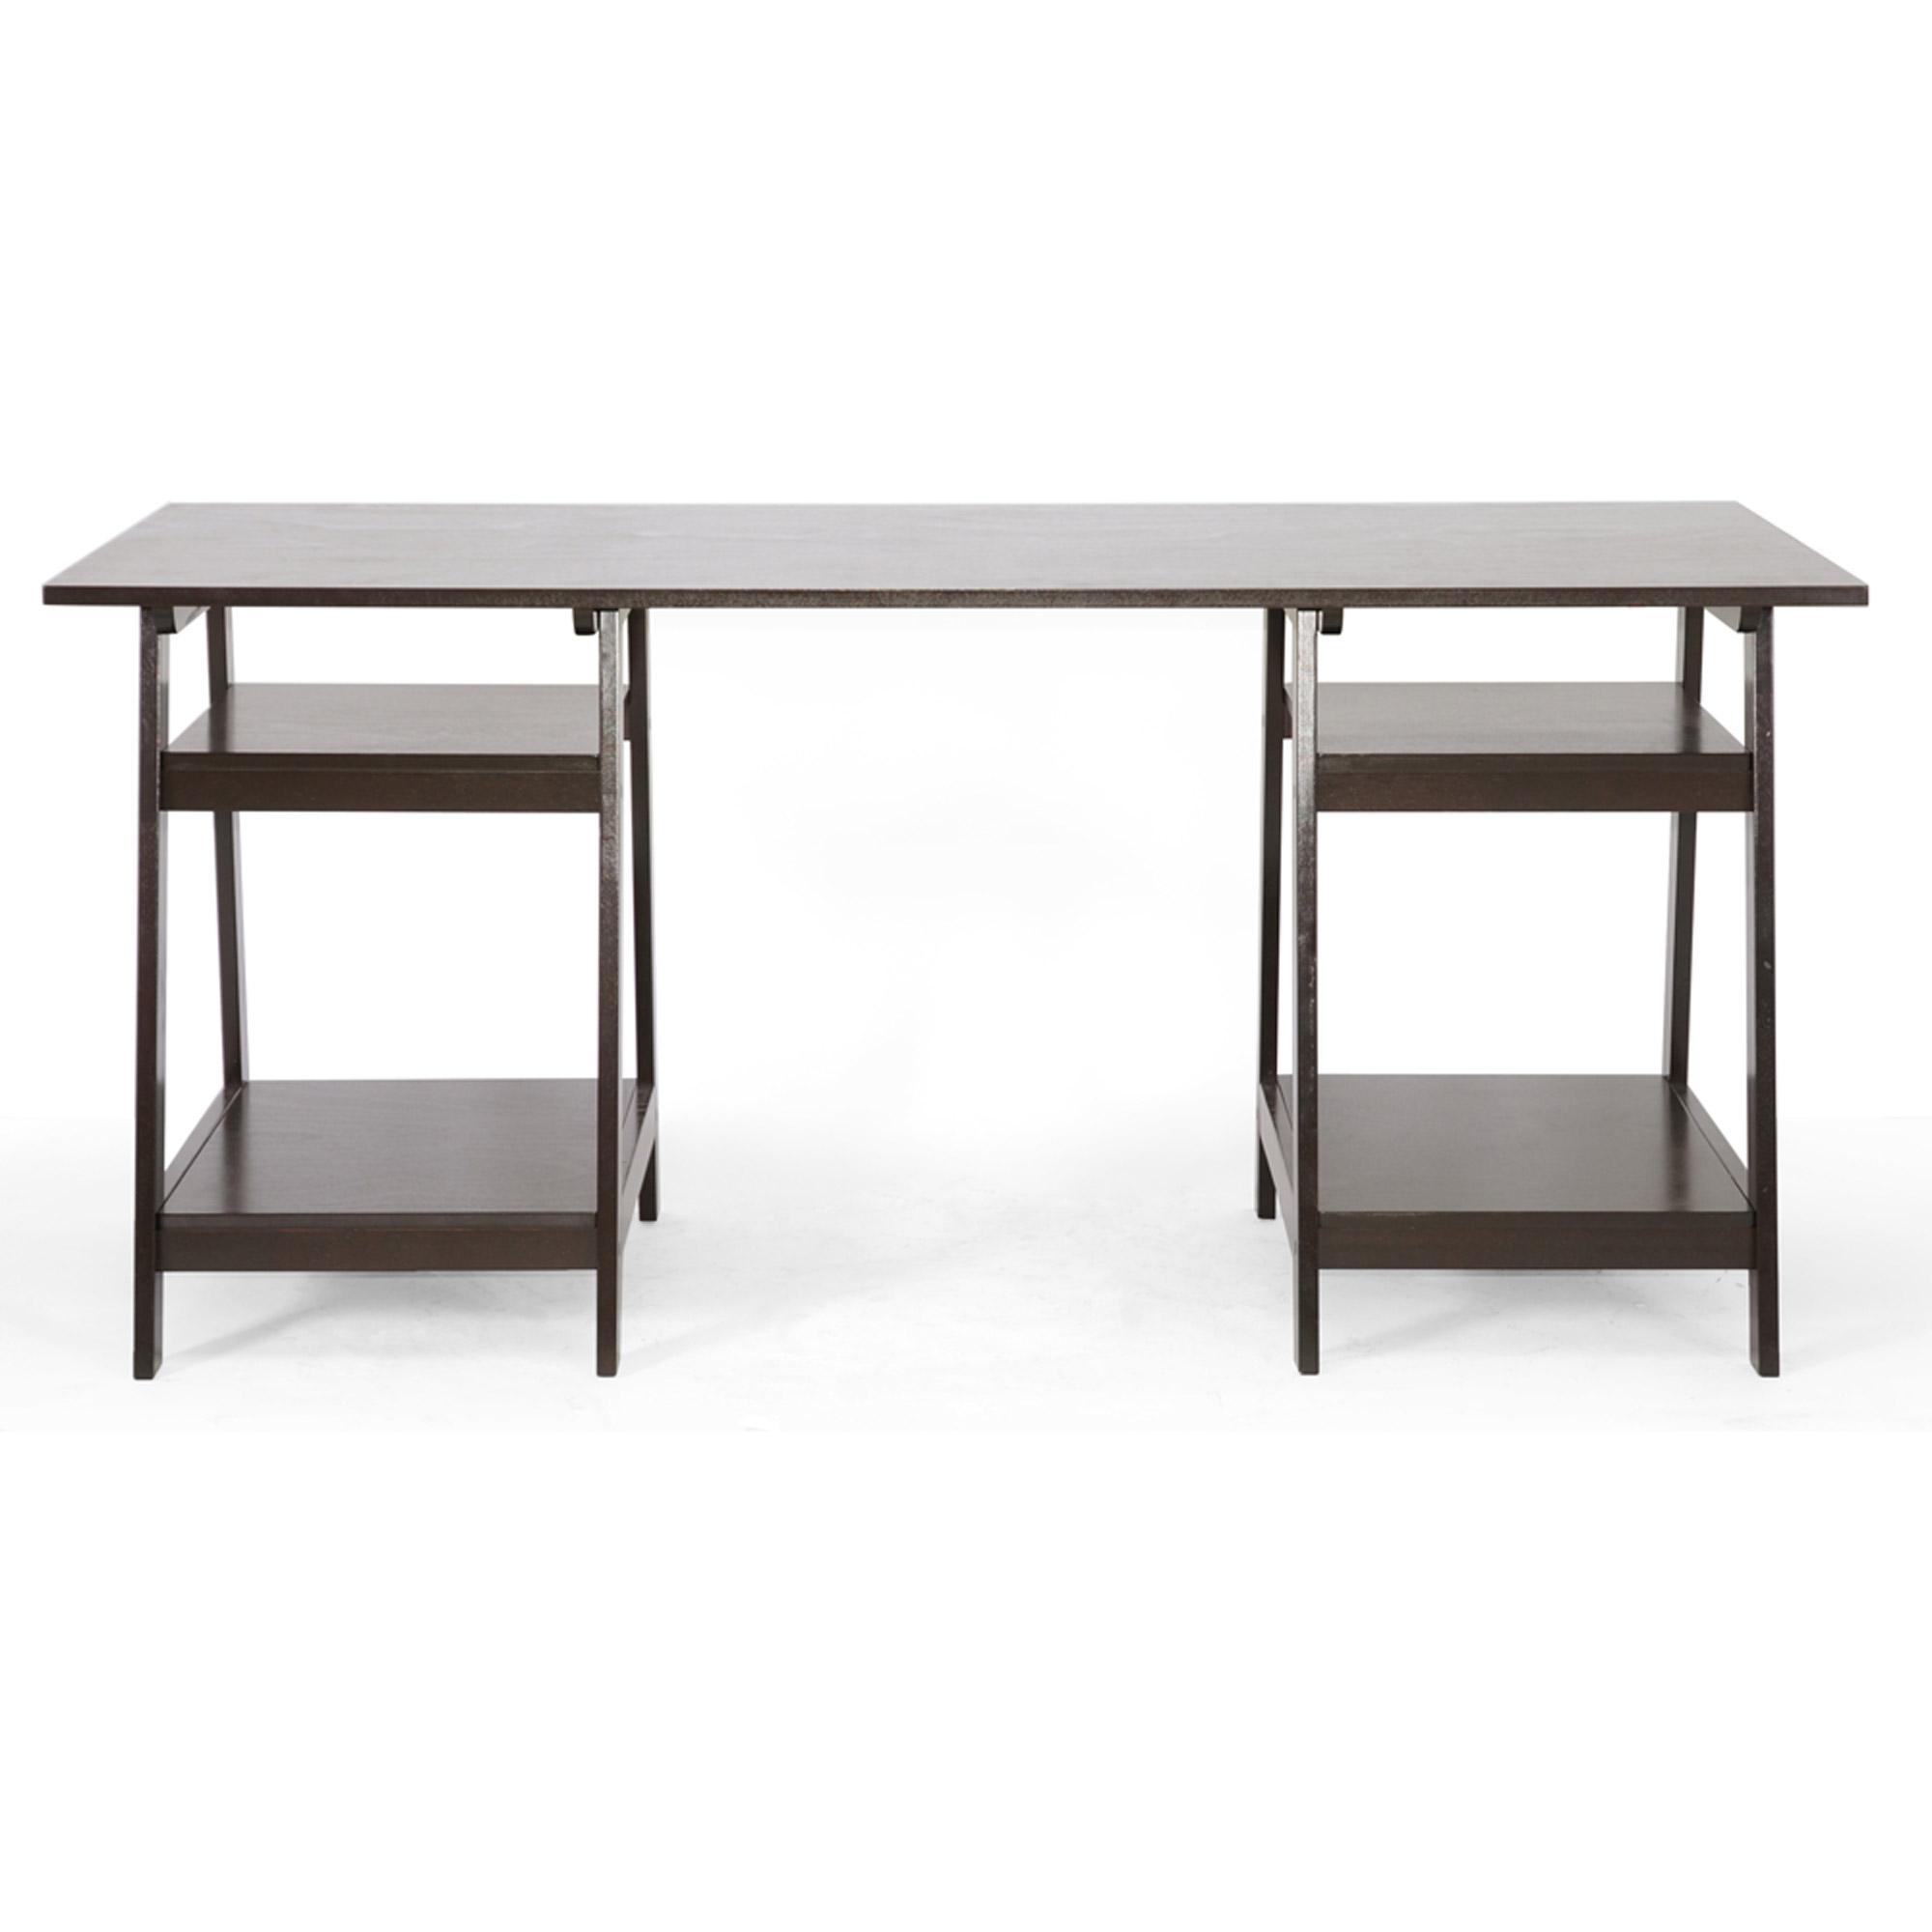 Large Modern Desk Mott Dark Brown Wood Modern Desk With Sawhorse Legs Large